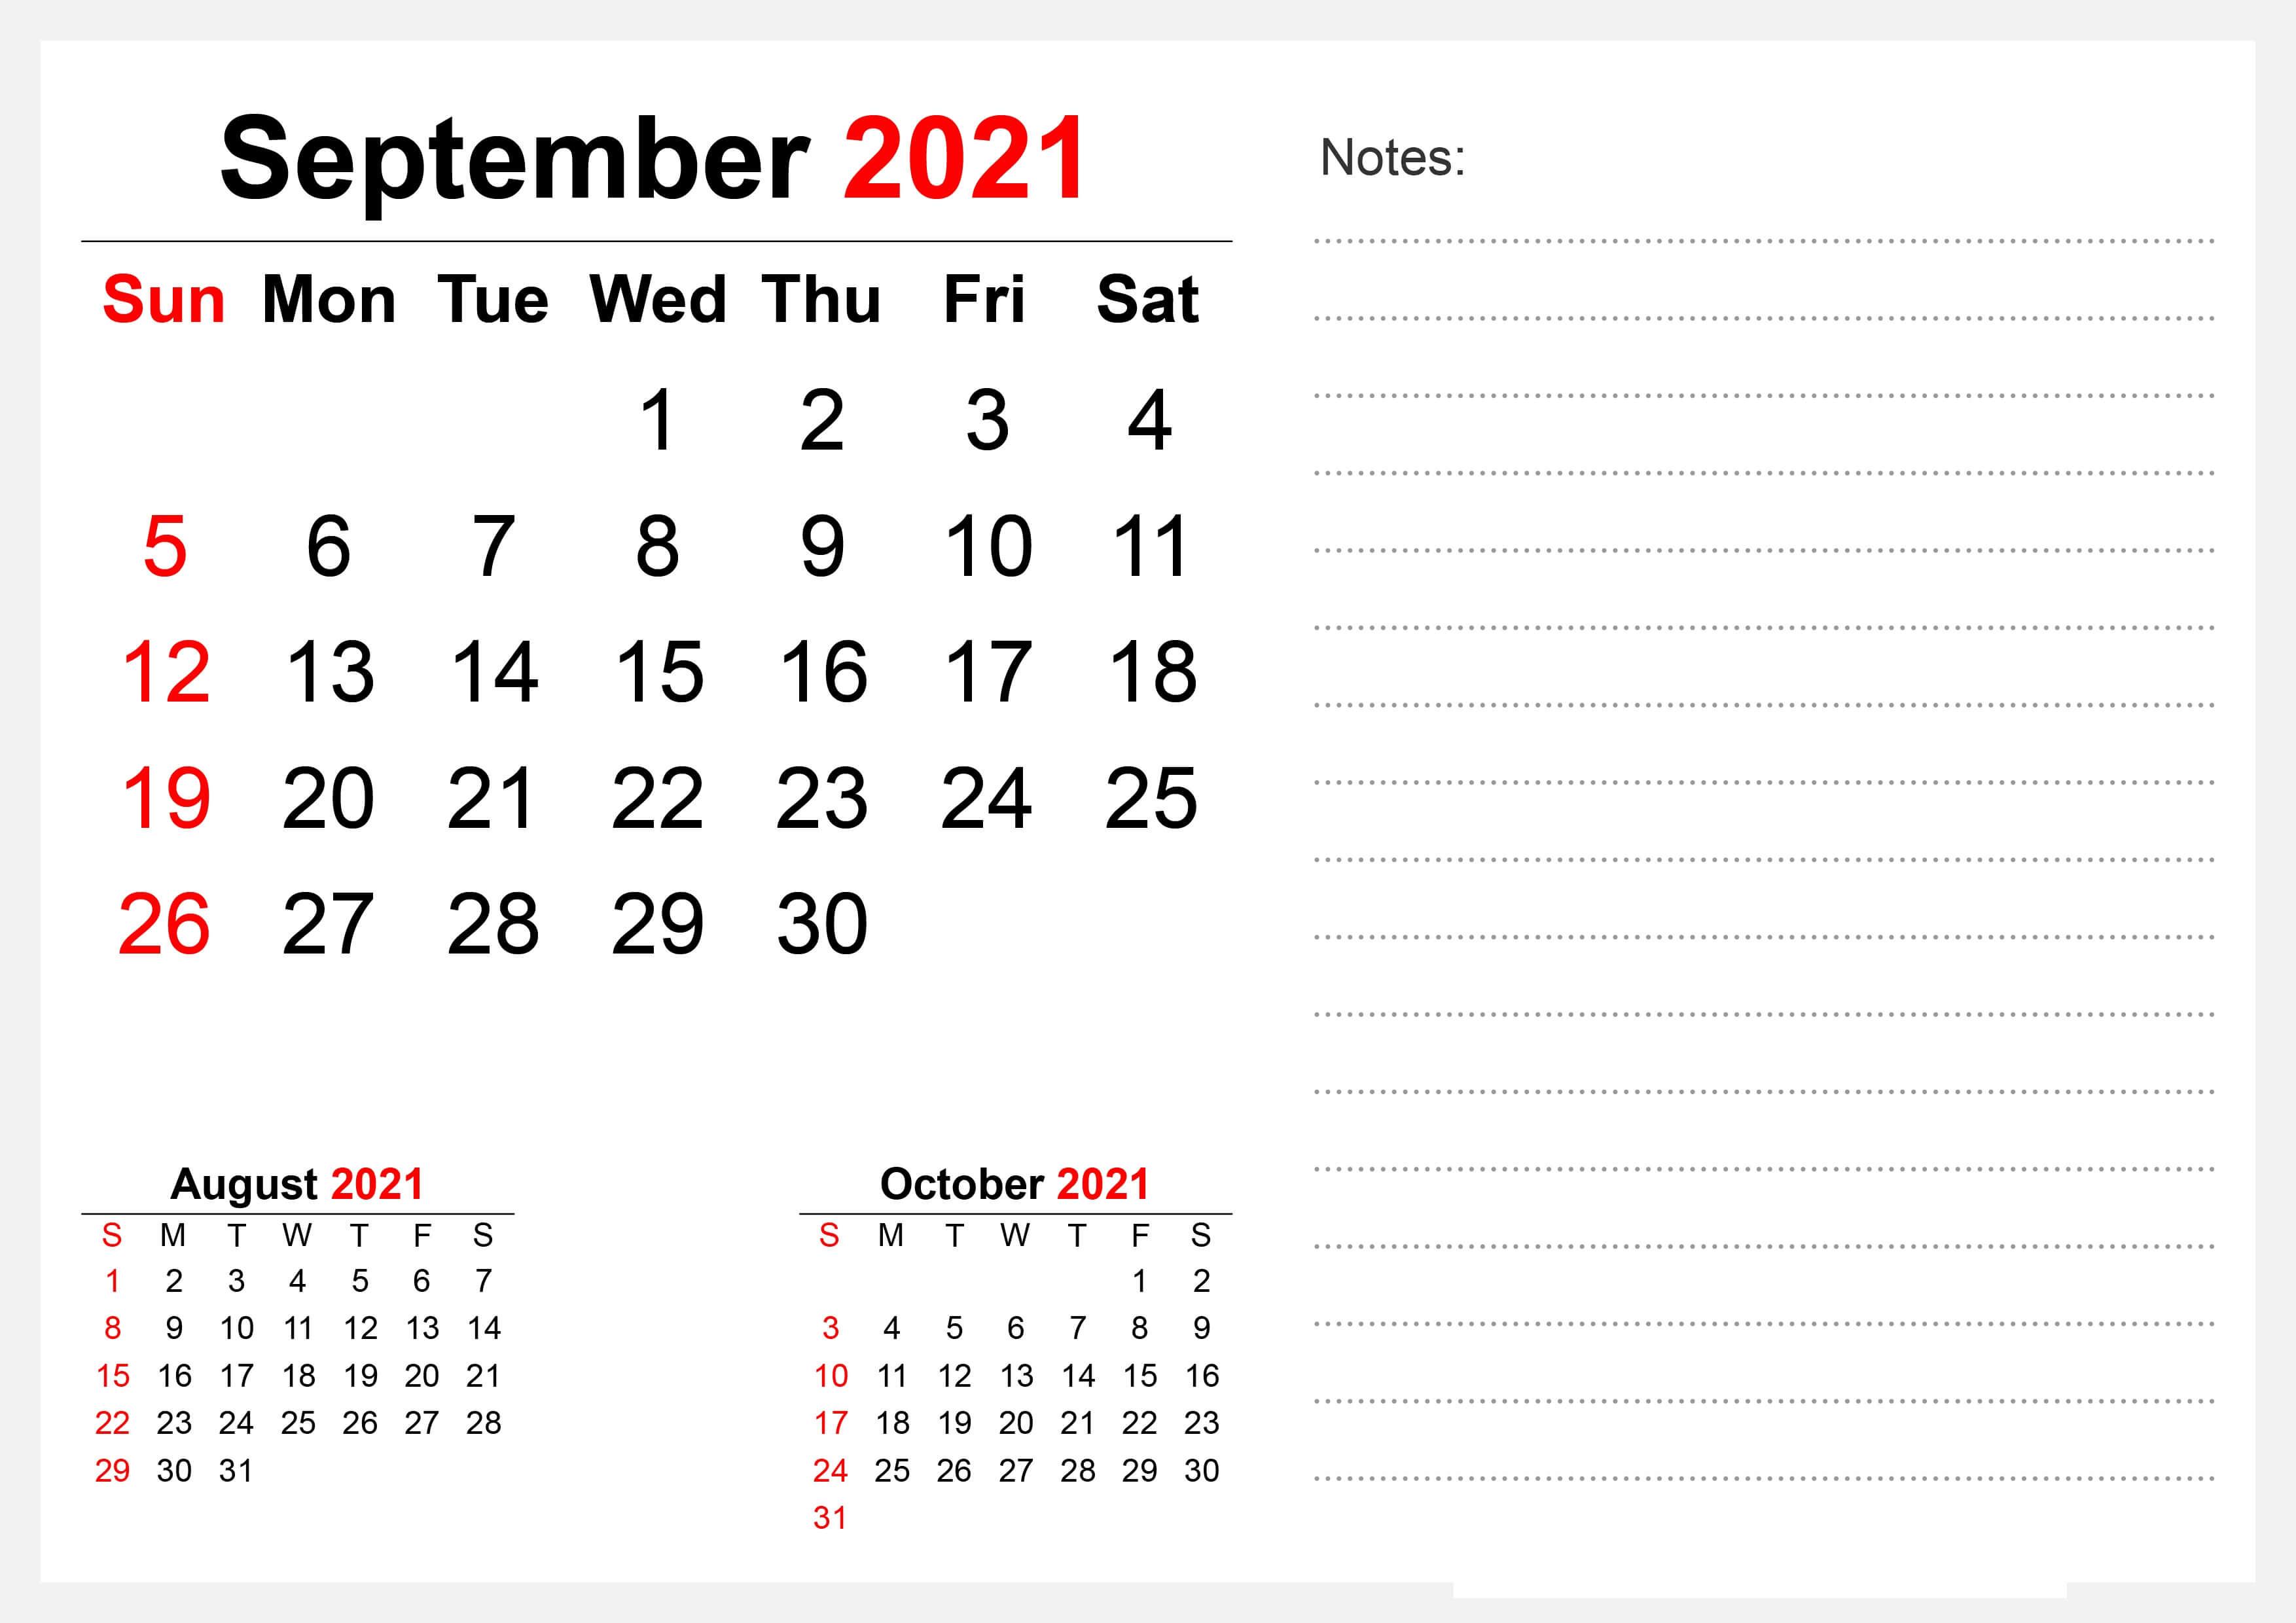 September 2021 Calendar with Notes